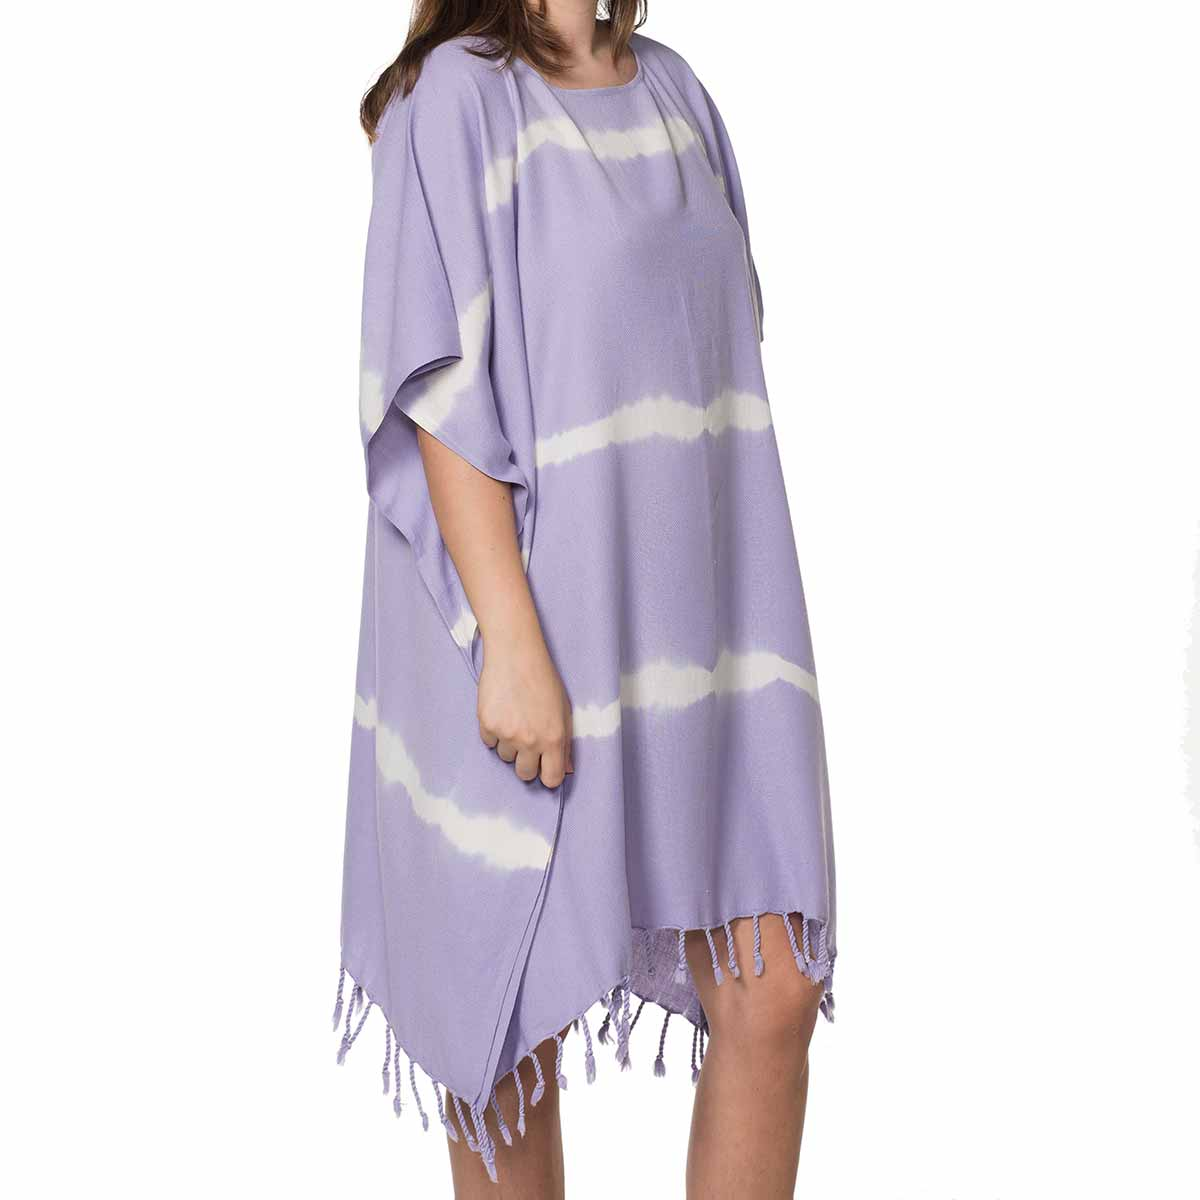 Tunic Daisy / Tie Dye - Base Lilac